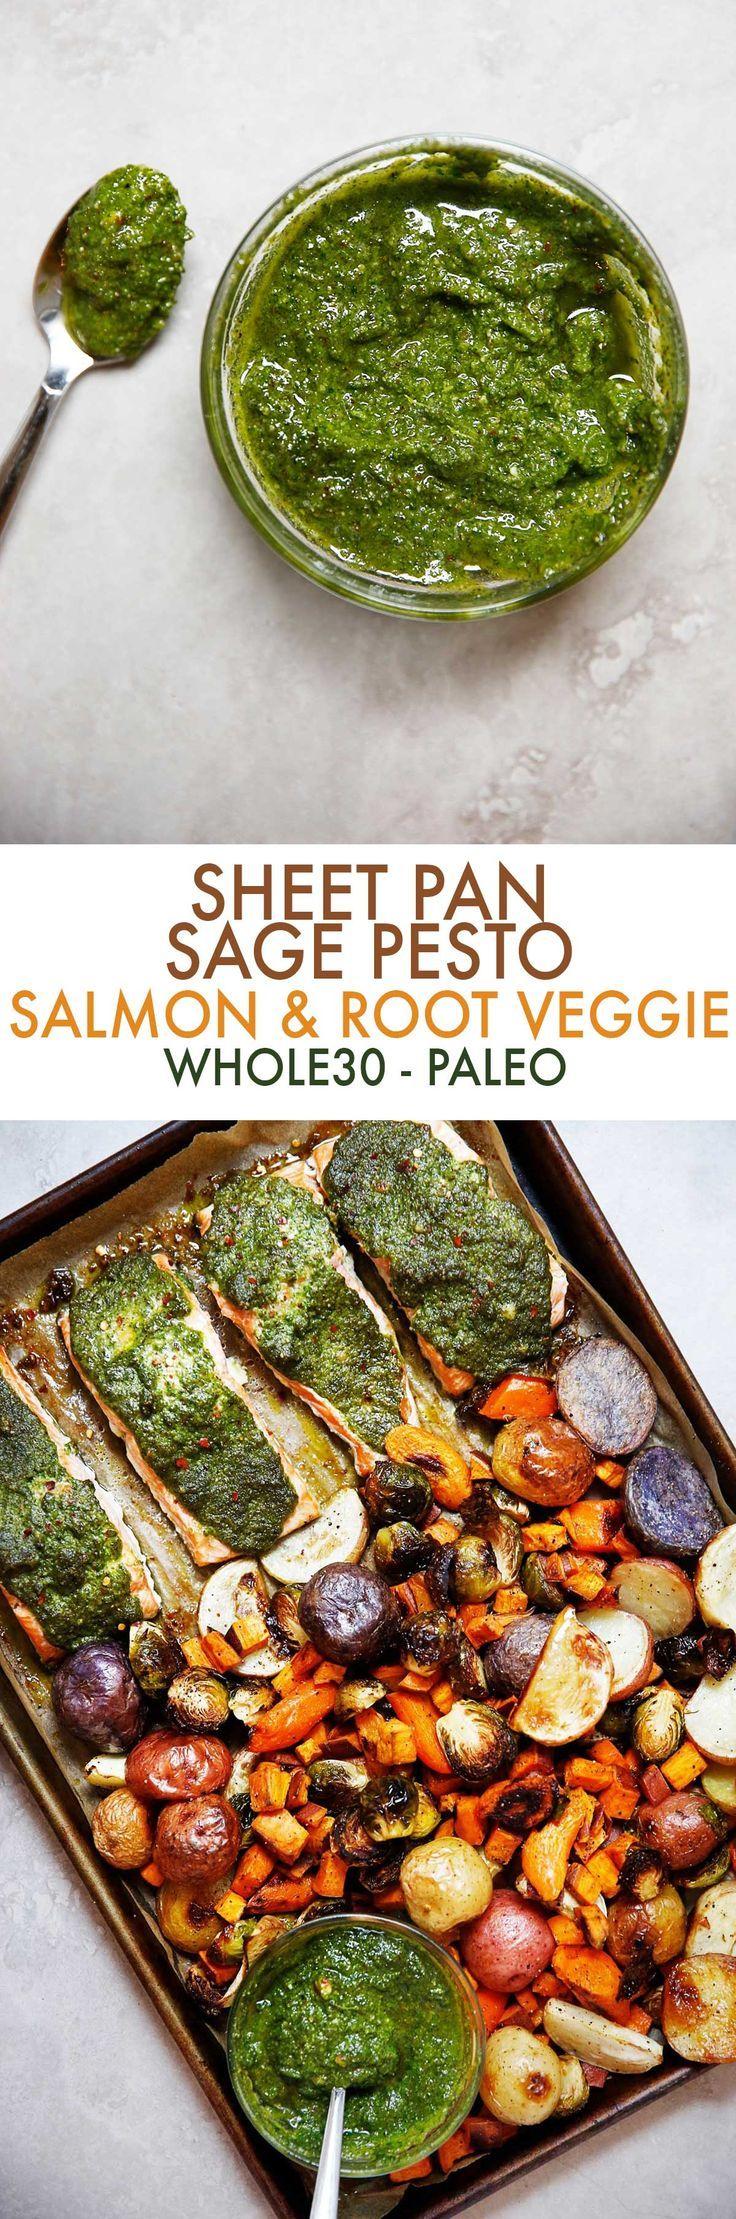 Sheet Pan Root Vegetable and Sage Pesto Salmon - Lexi's Clean Kitchen #sheetpan #salmon #pesto #veggies #easydinner